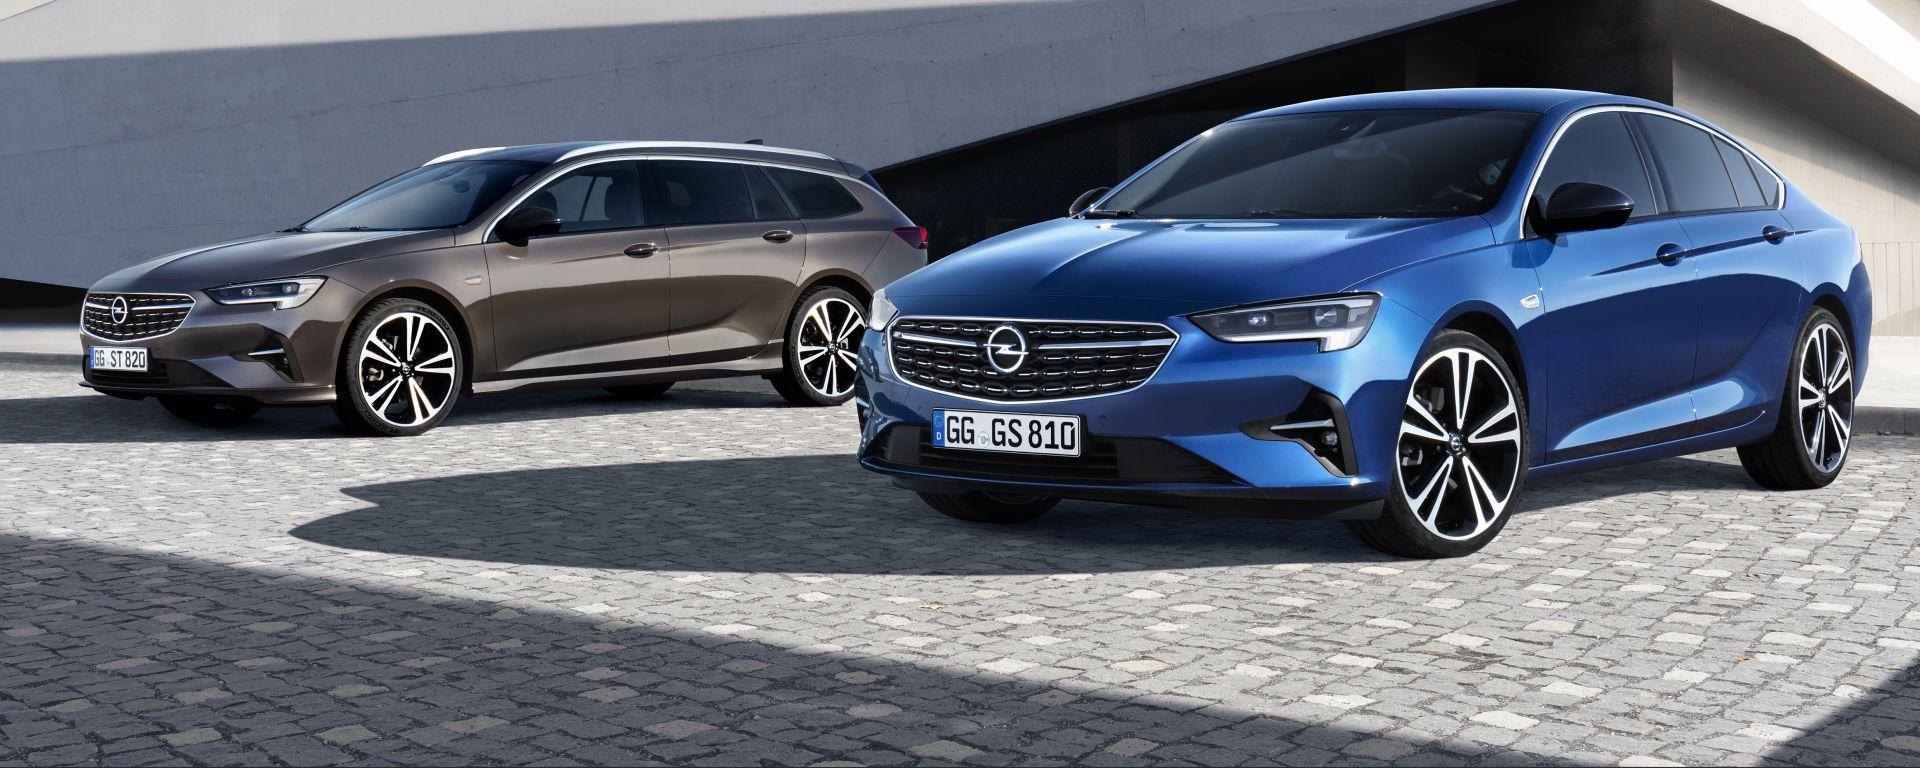 Nuova Opel Insignia 2020